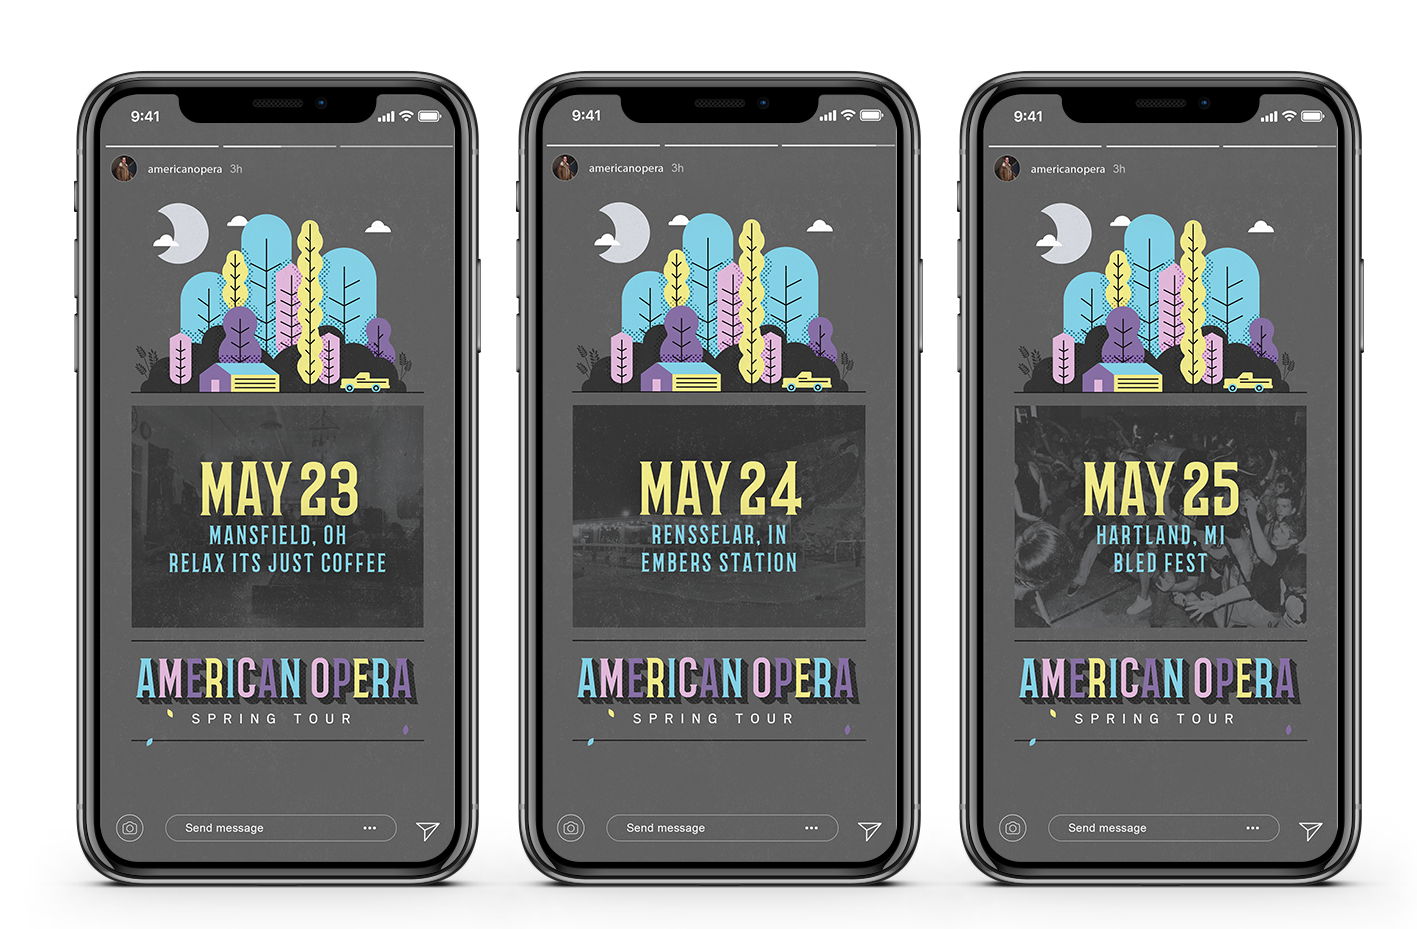 American-Opera_Mobile-Design-v2.png